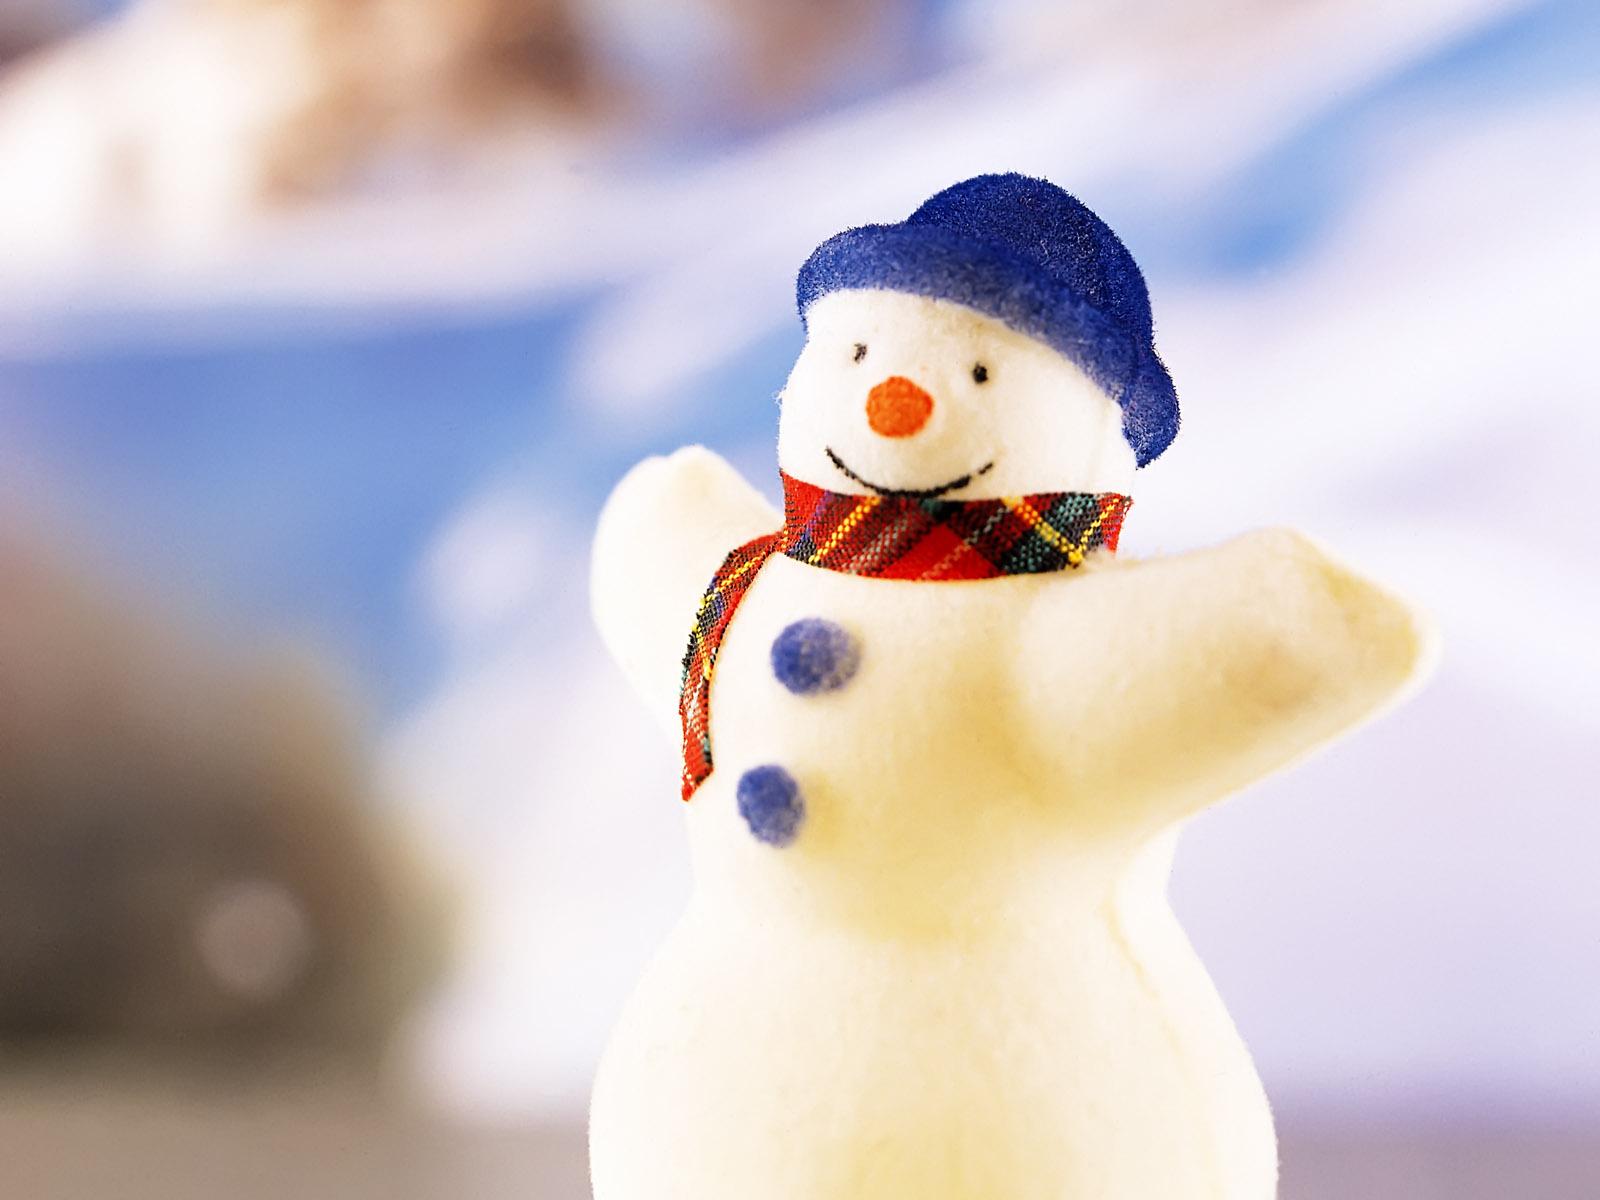 snowman_xmas_toy